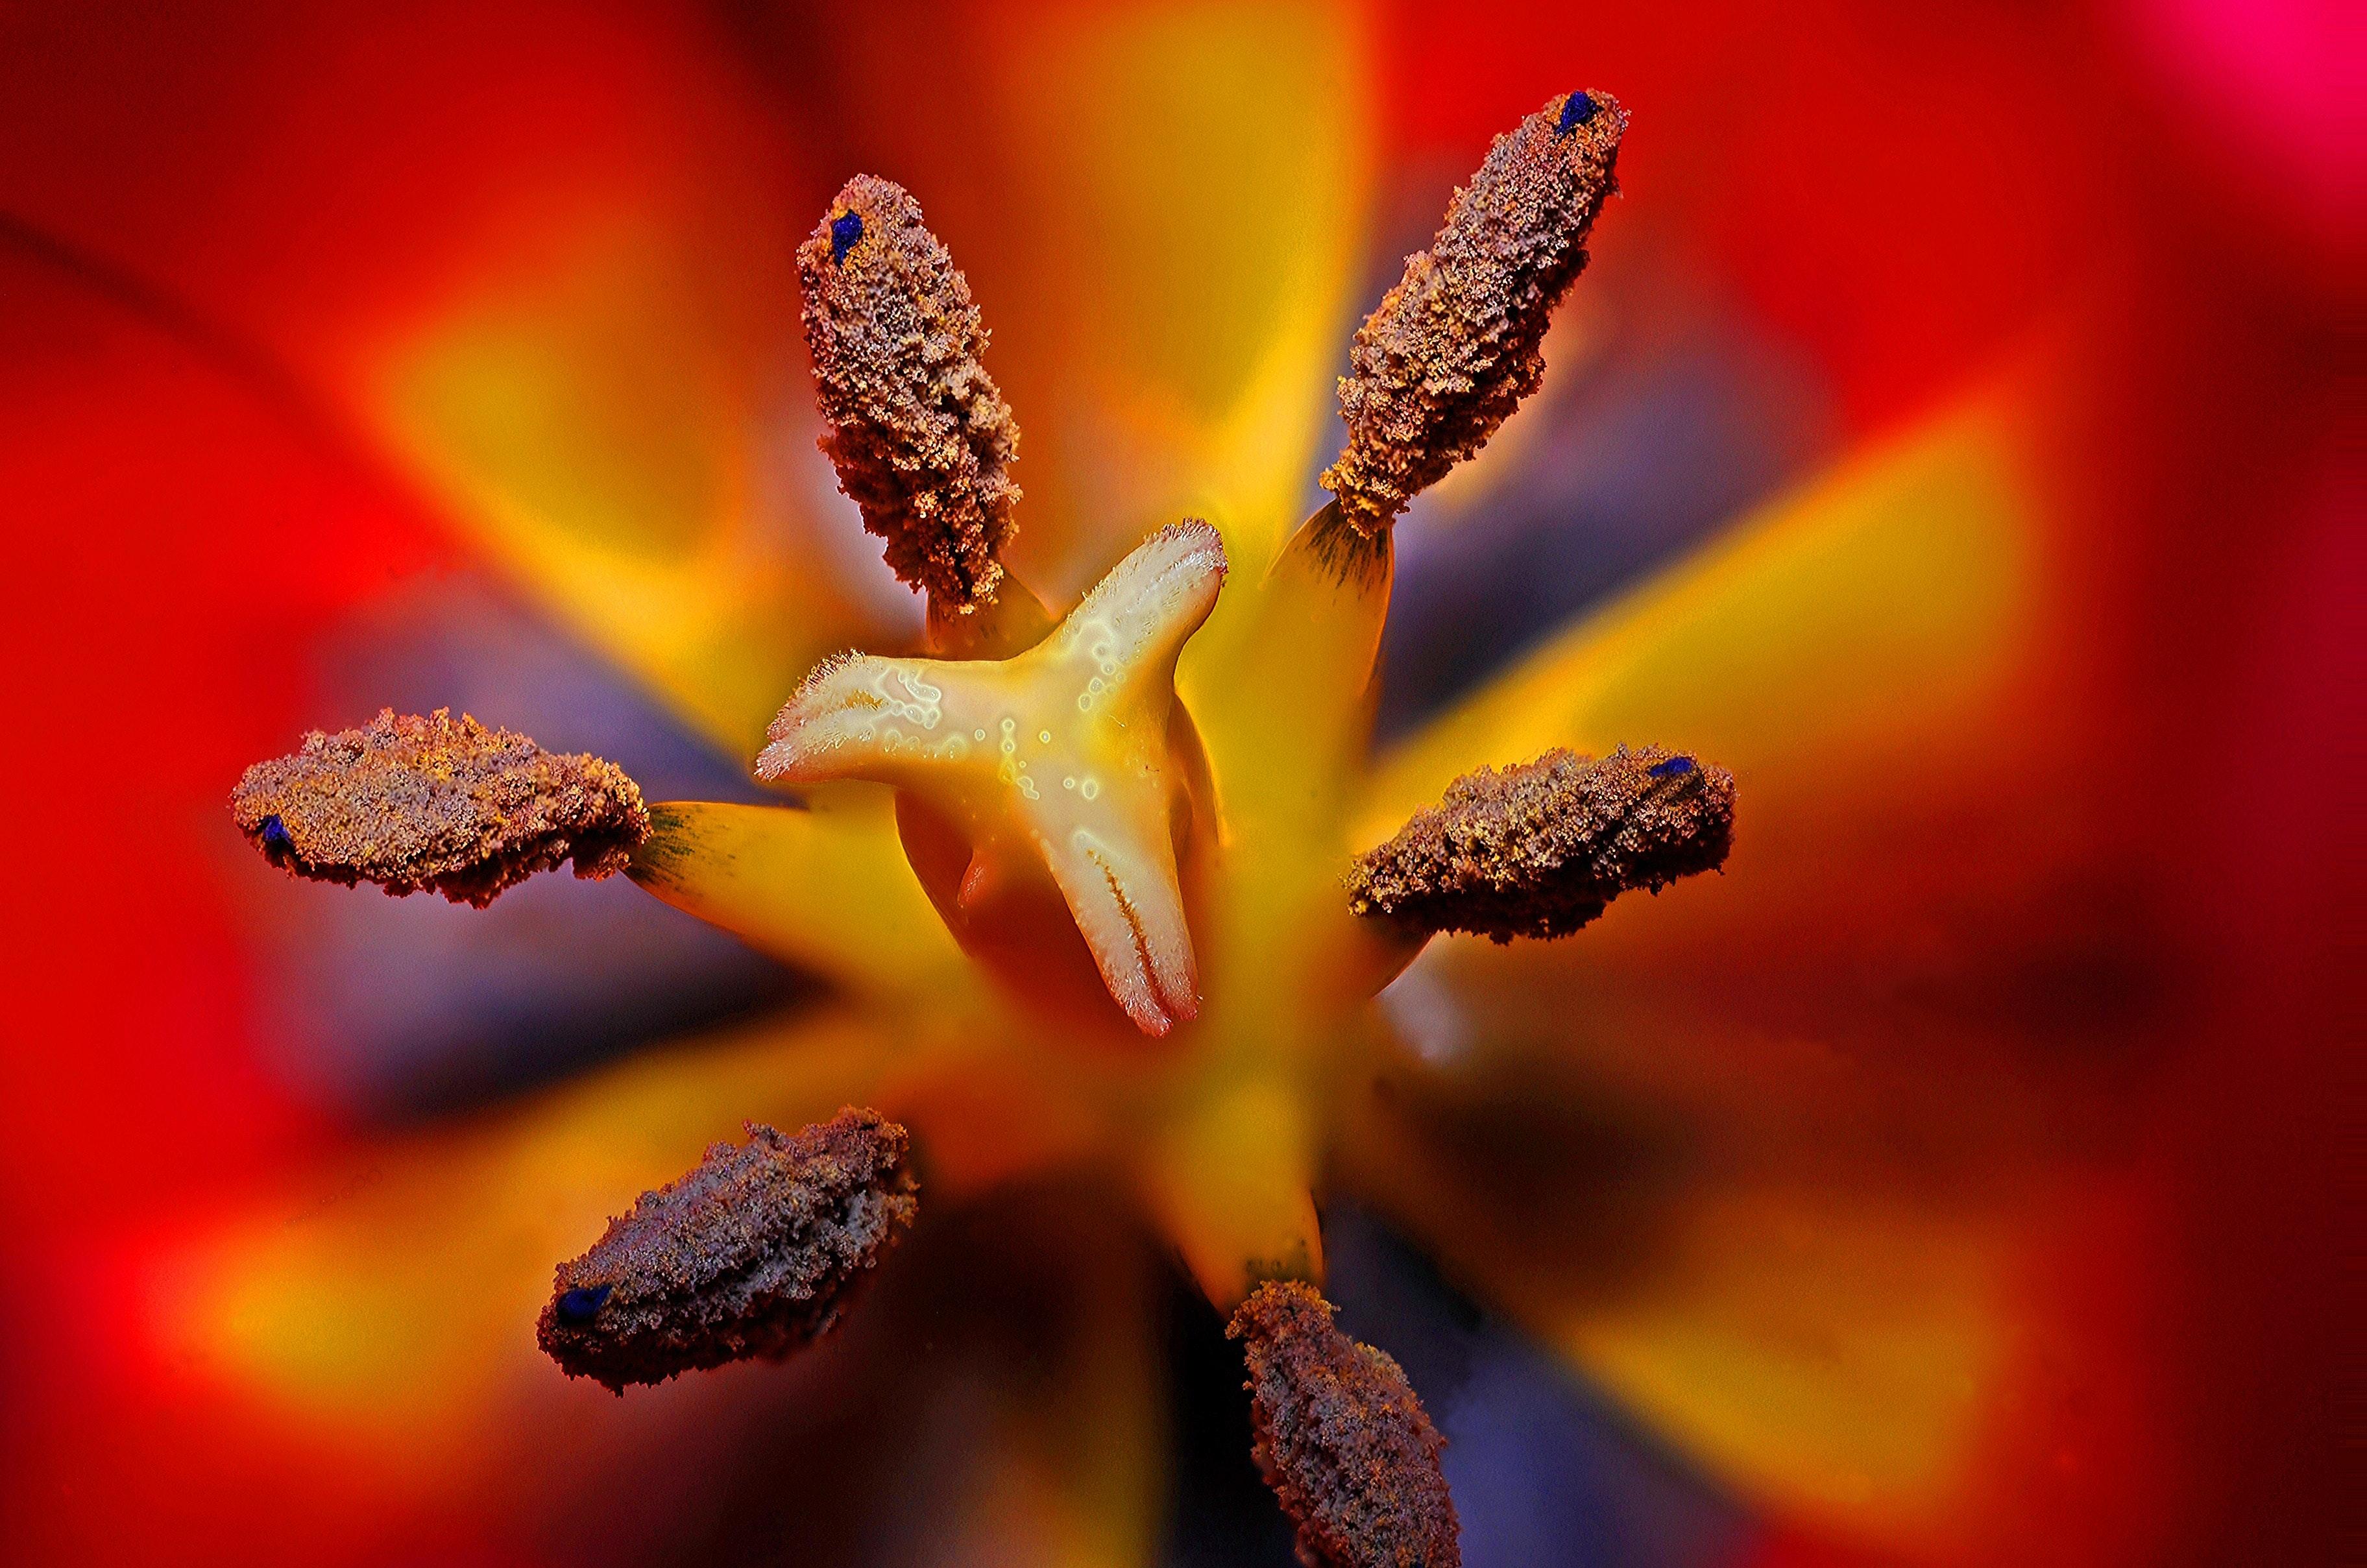 Free Photo Black Yellow And Red Flower Stigma In Tilt Shift Lens